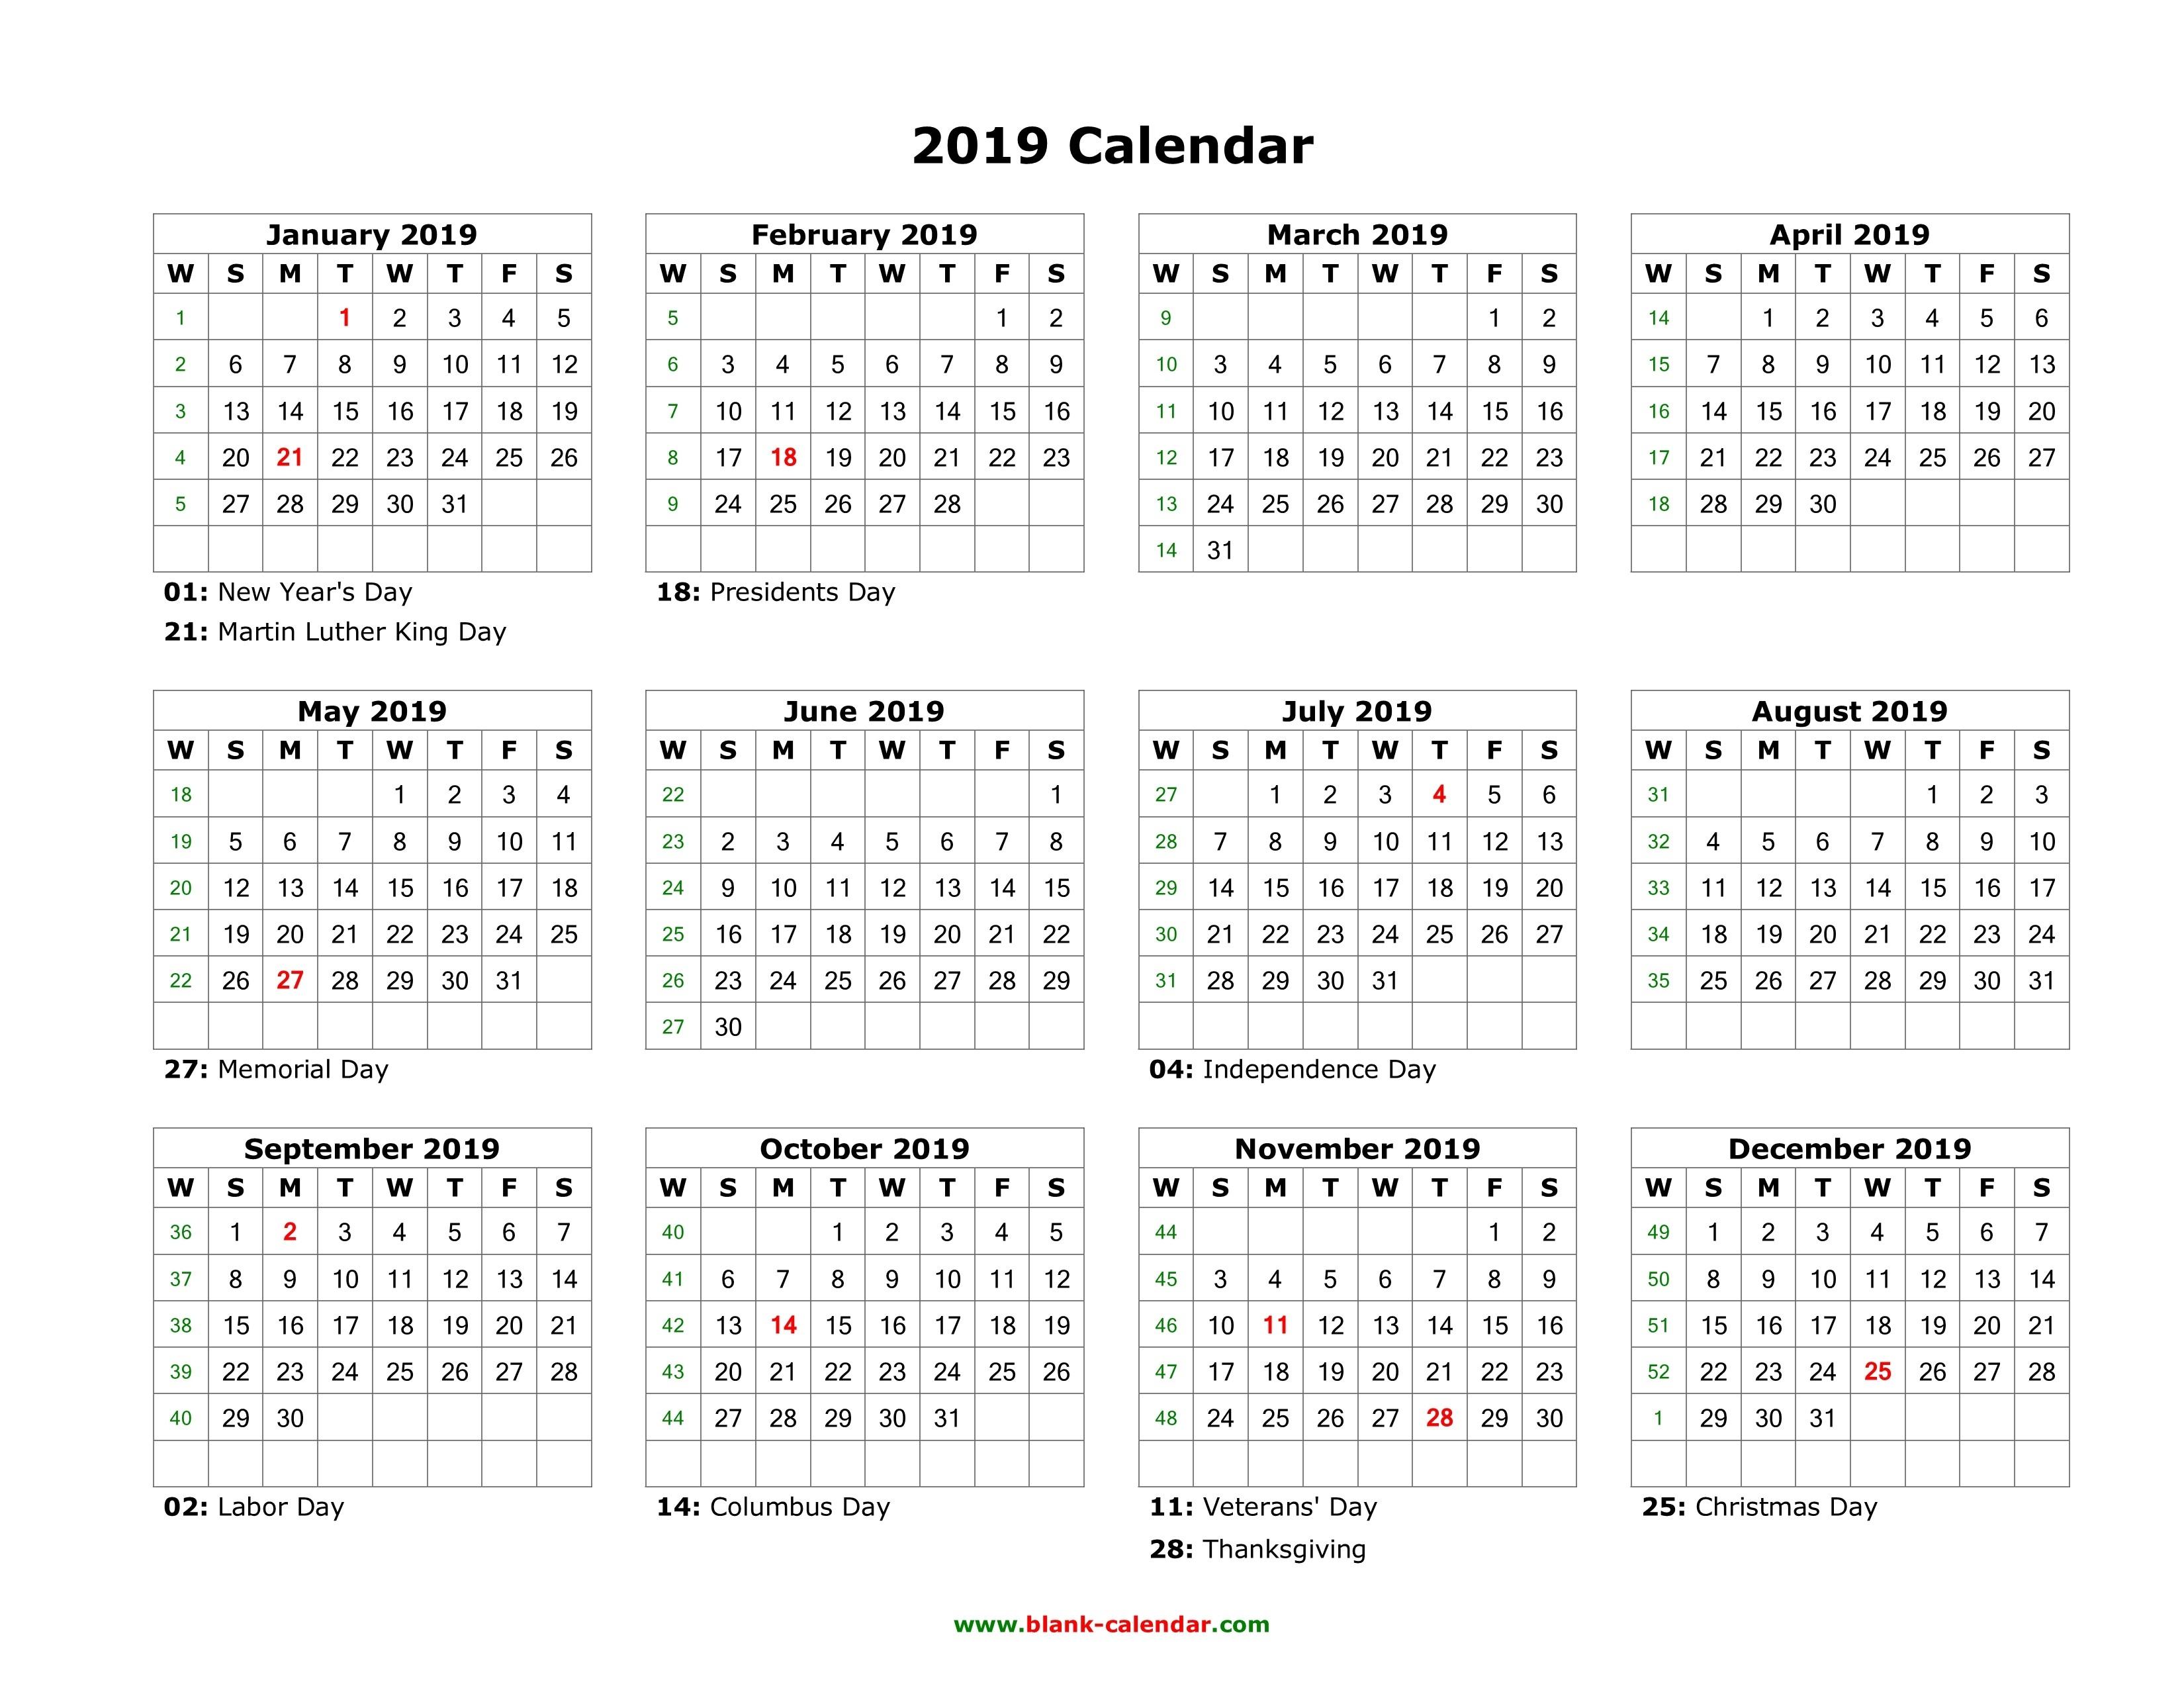 Template Calendar 2019 Indesign | Printable Calendar 2019-Calendar Template Indesign Free